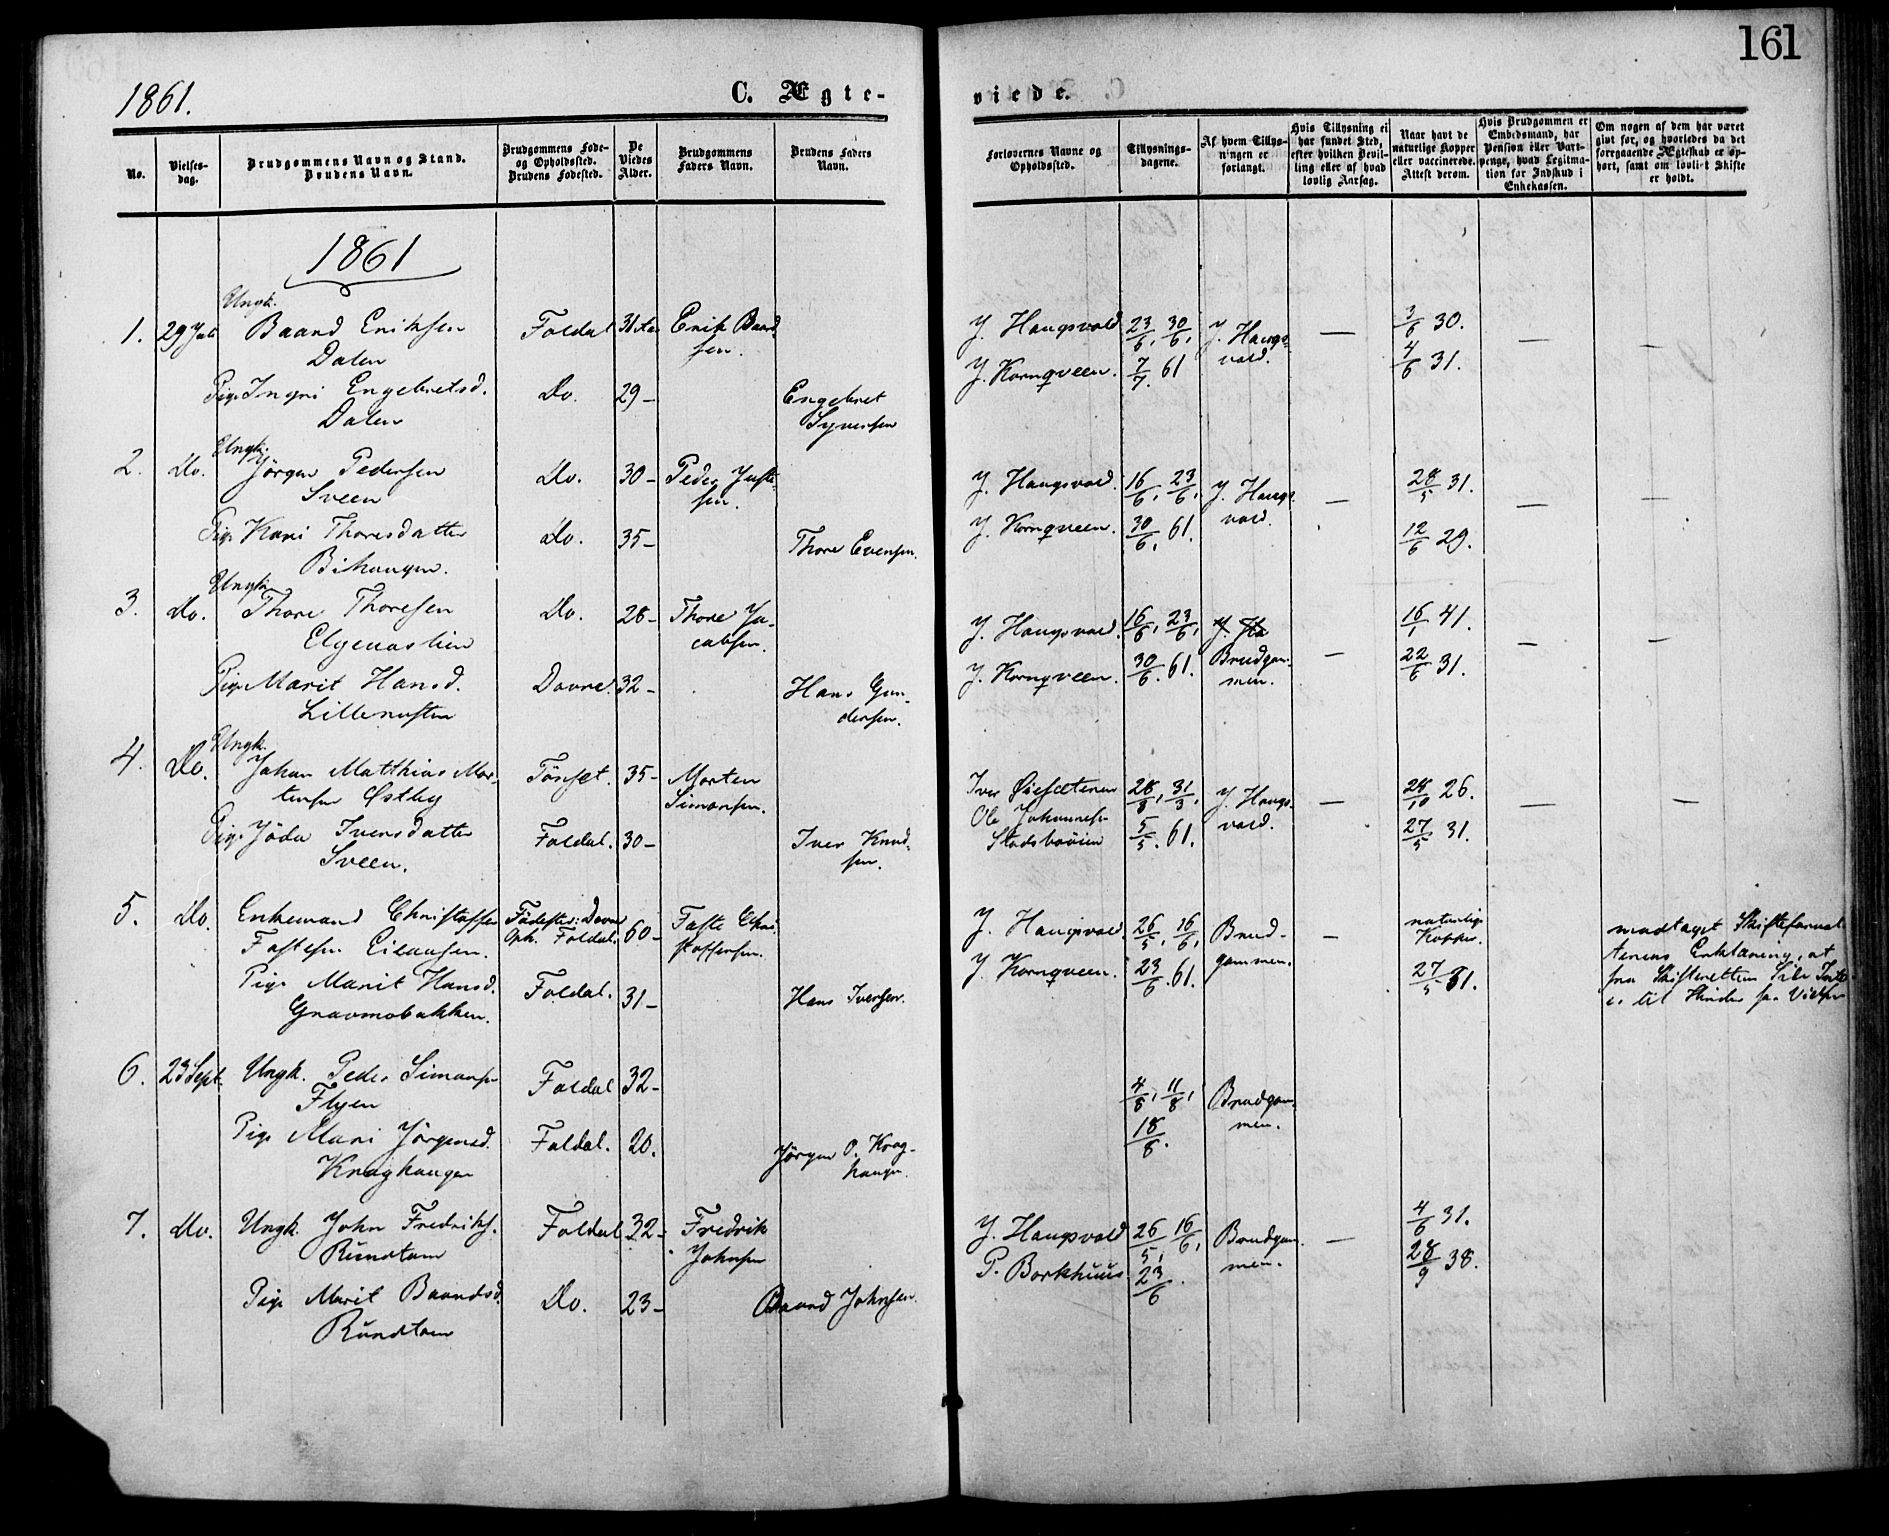 SAH, Lesja prestekontor, Ministerialbok nr. 7, 1854-1862, s. 161